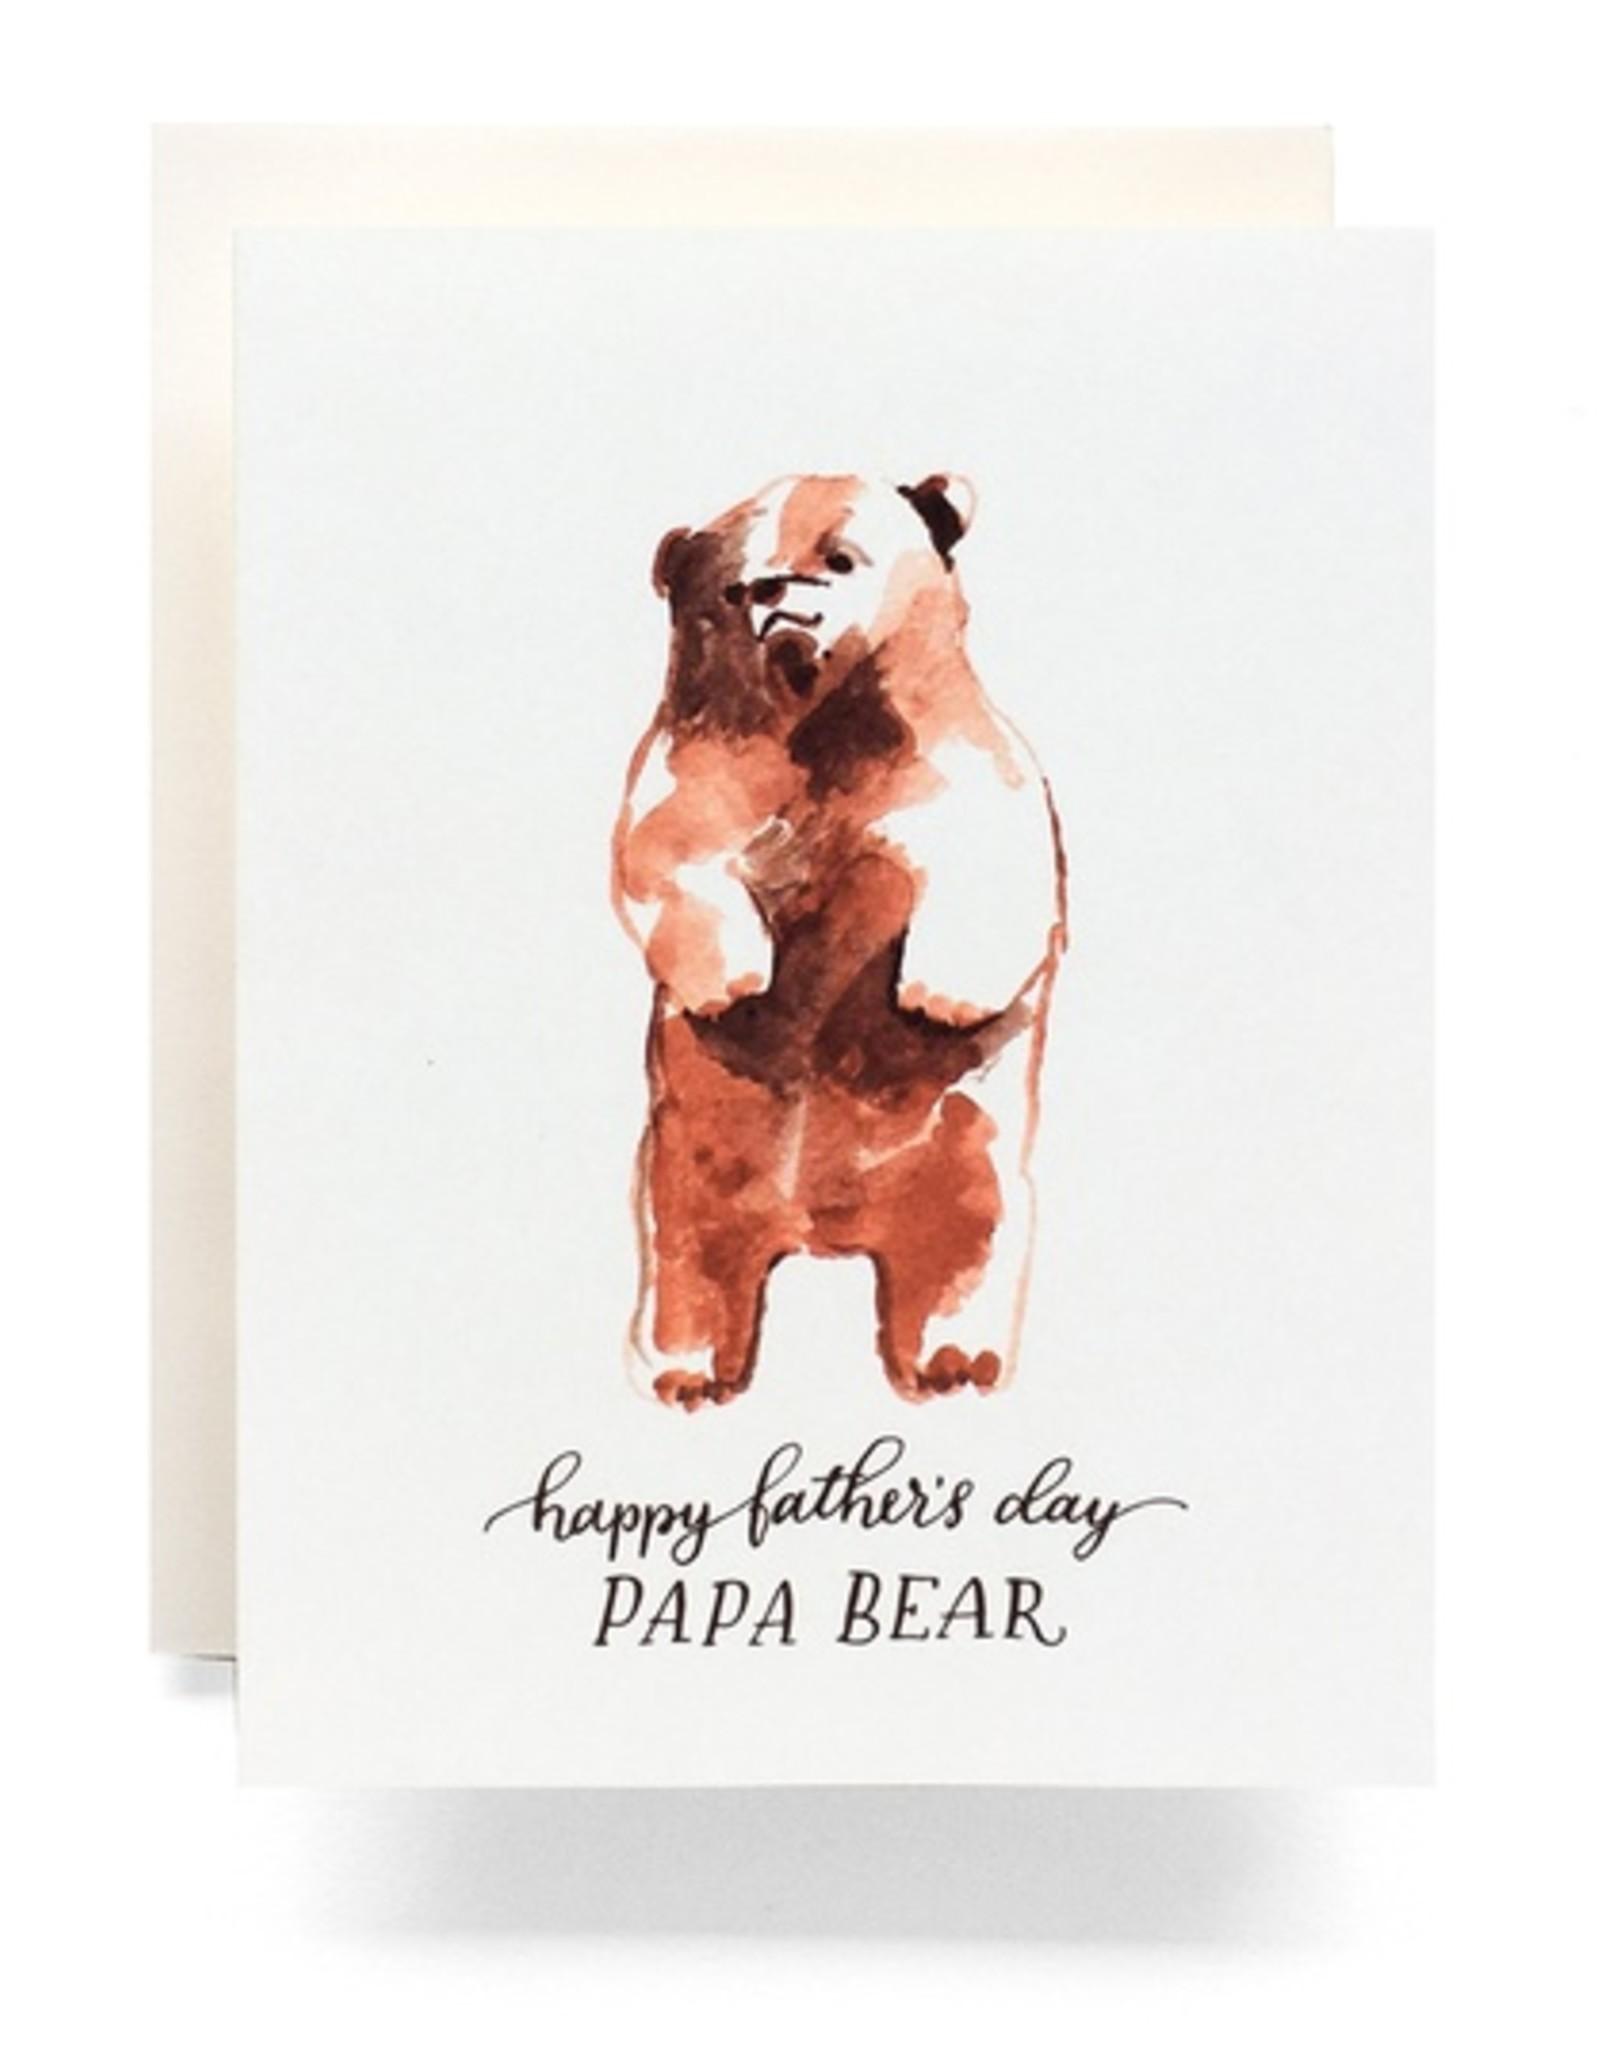 Papa Bear Fathers Day Card